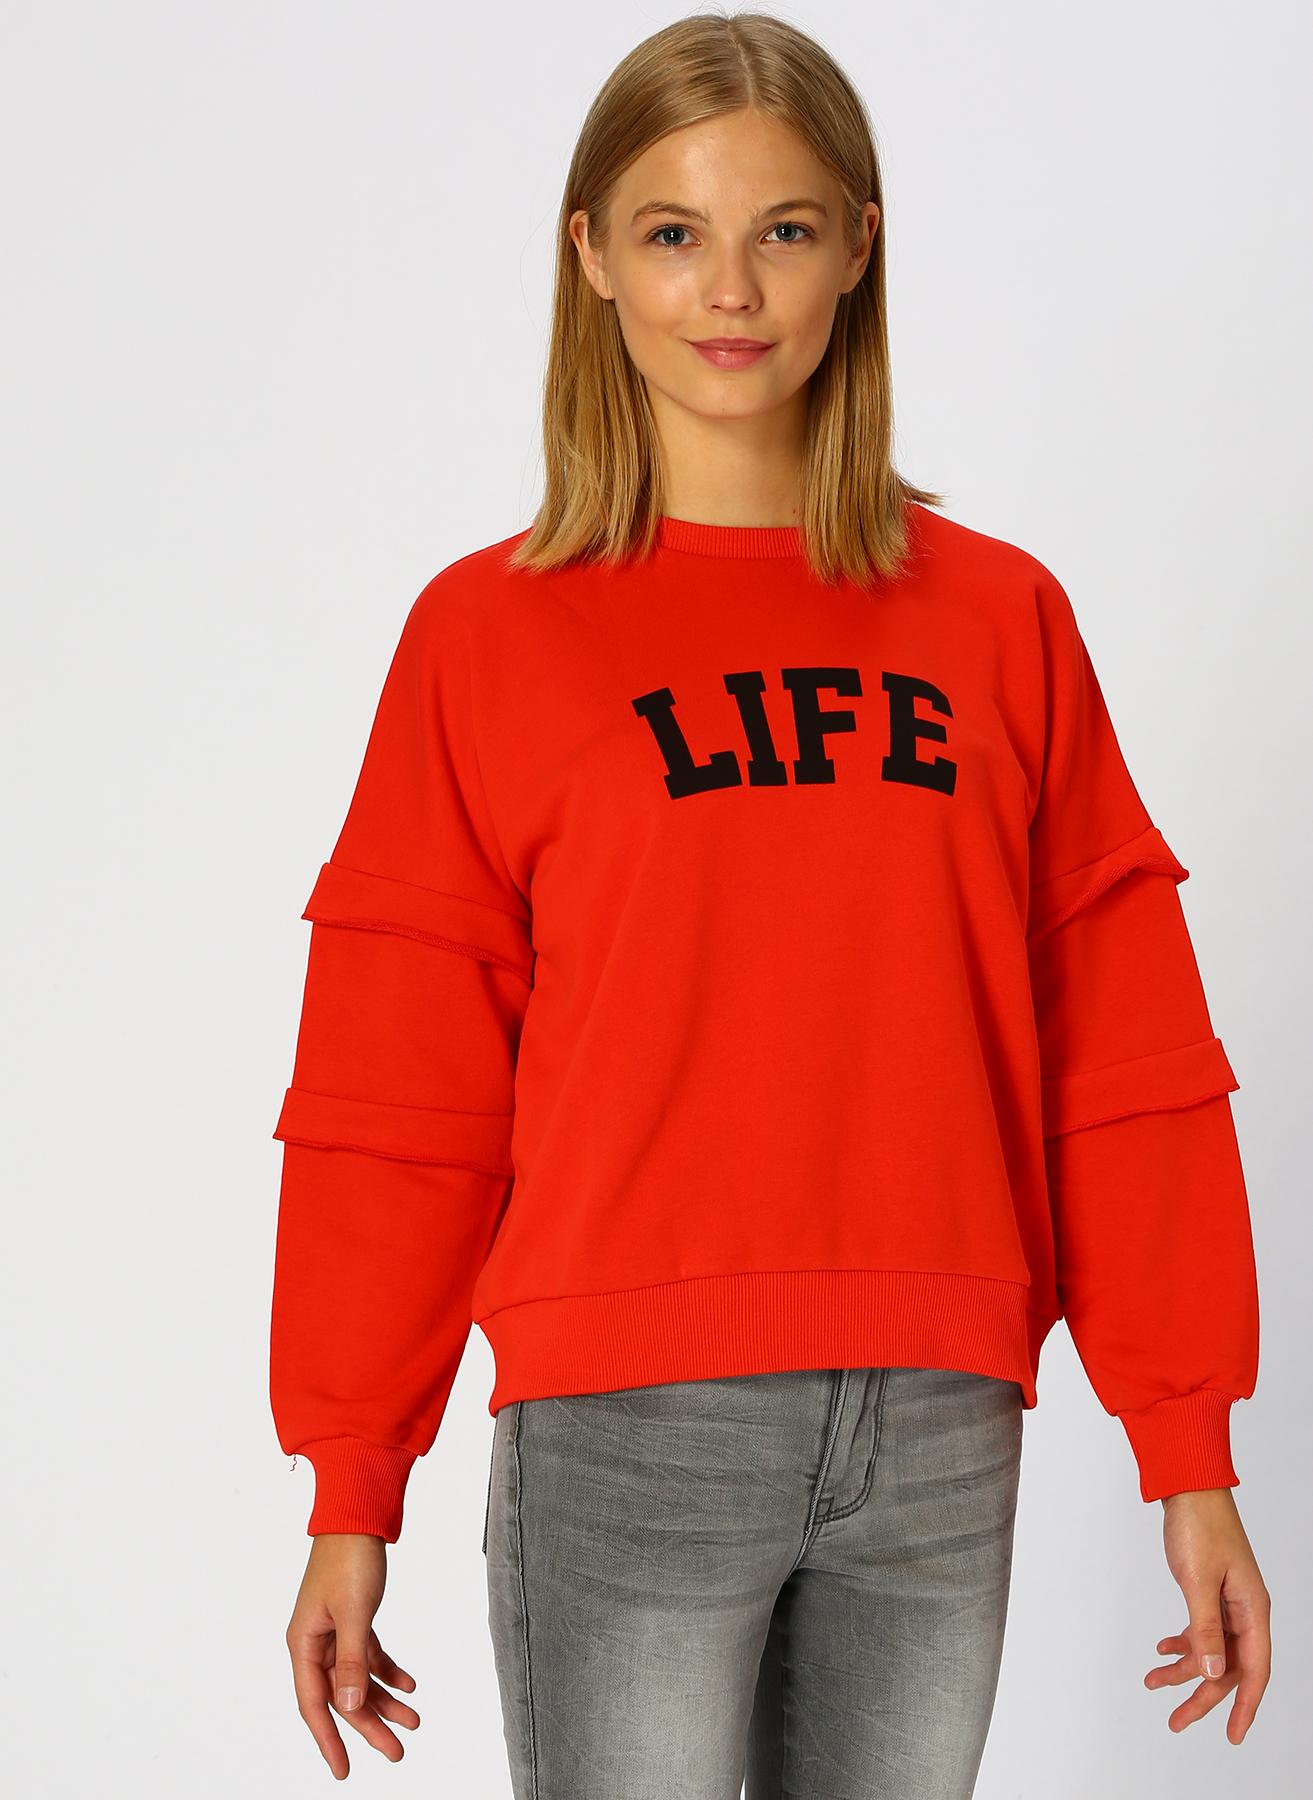 T-Box Kırmızı Sweatshirt S 5001628903002 Ürün Resmi